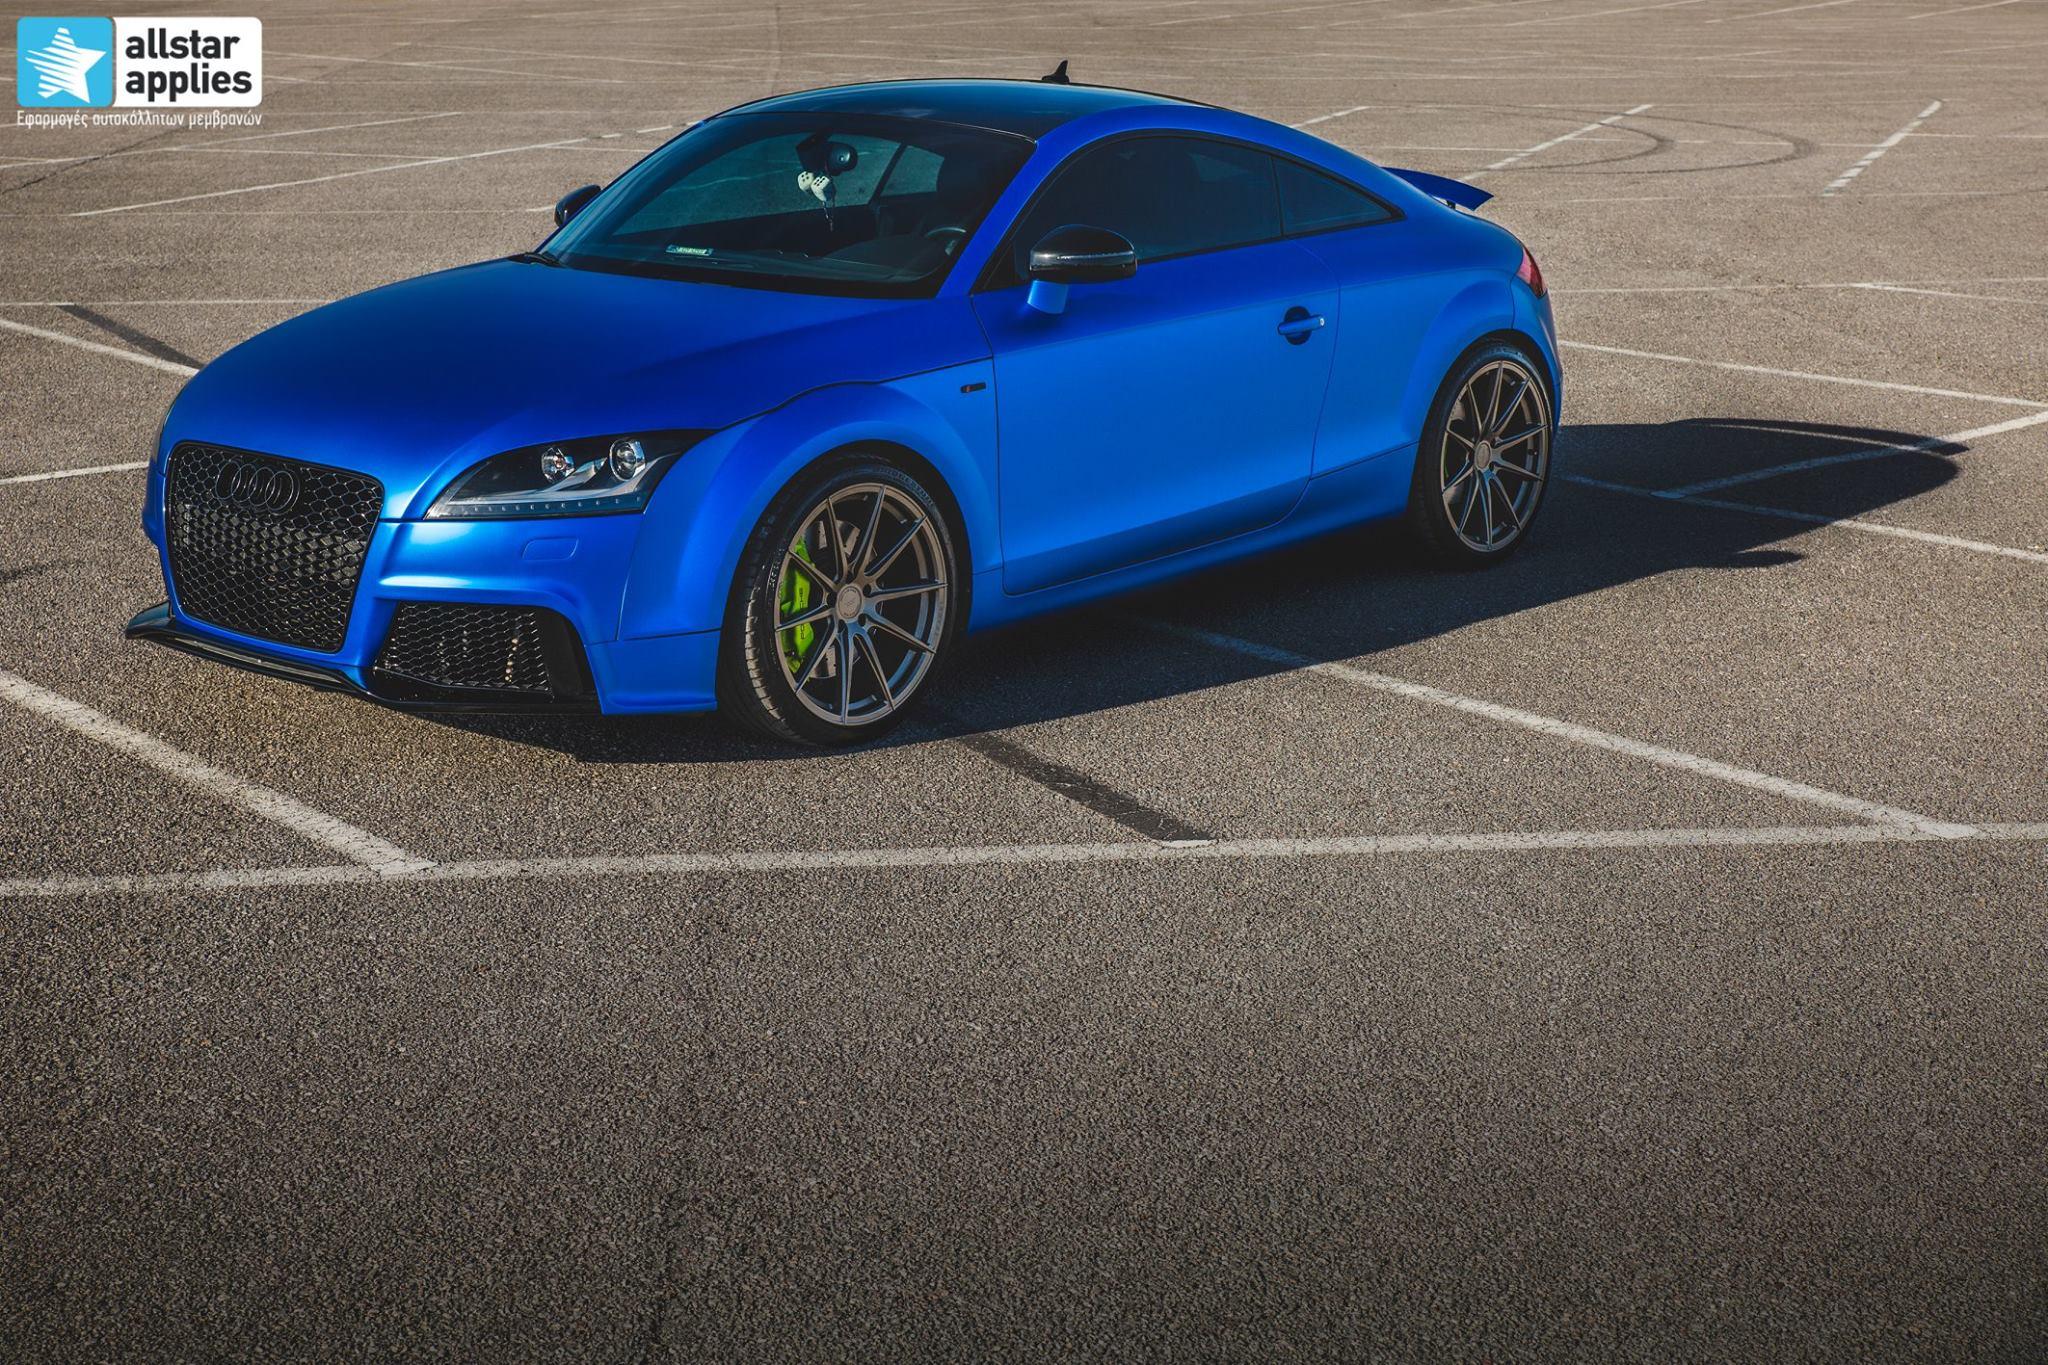 Audi TT - Matte Iced Blue + Ispiri Wheels FFR1 Matte (9)